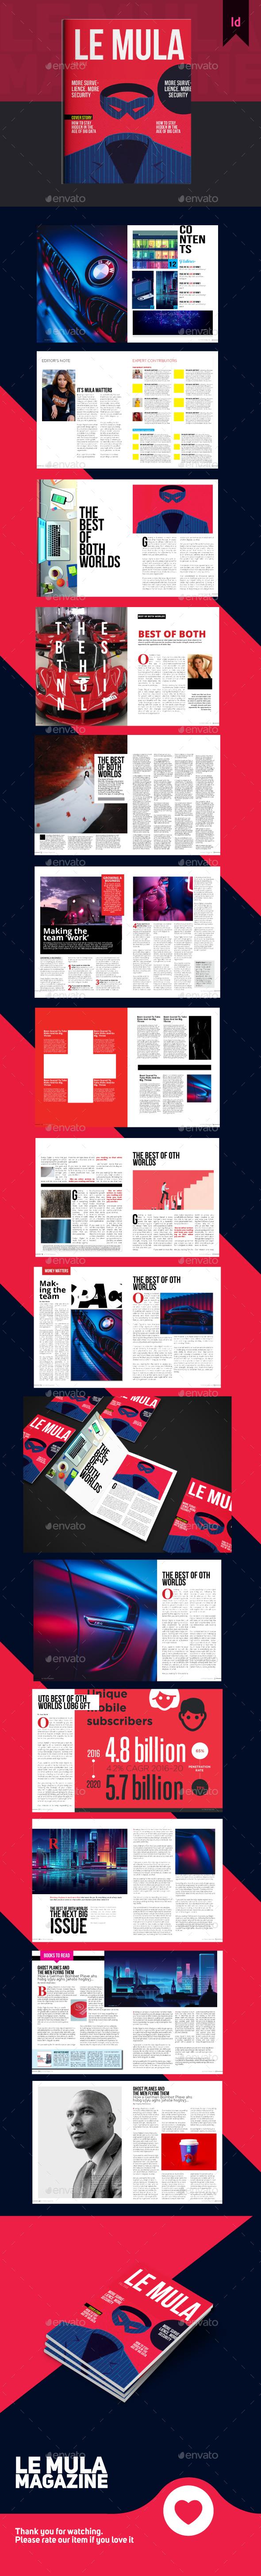 Le Mula Finance Magazine Template - Magazines Print Templates